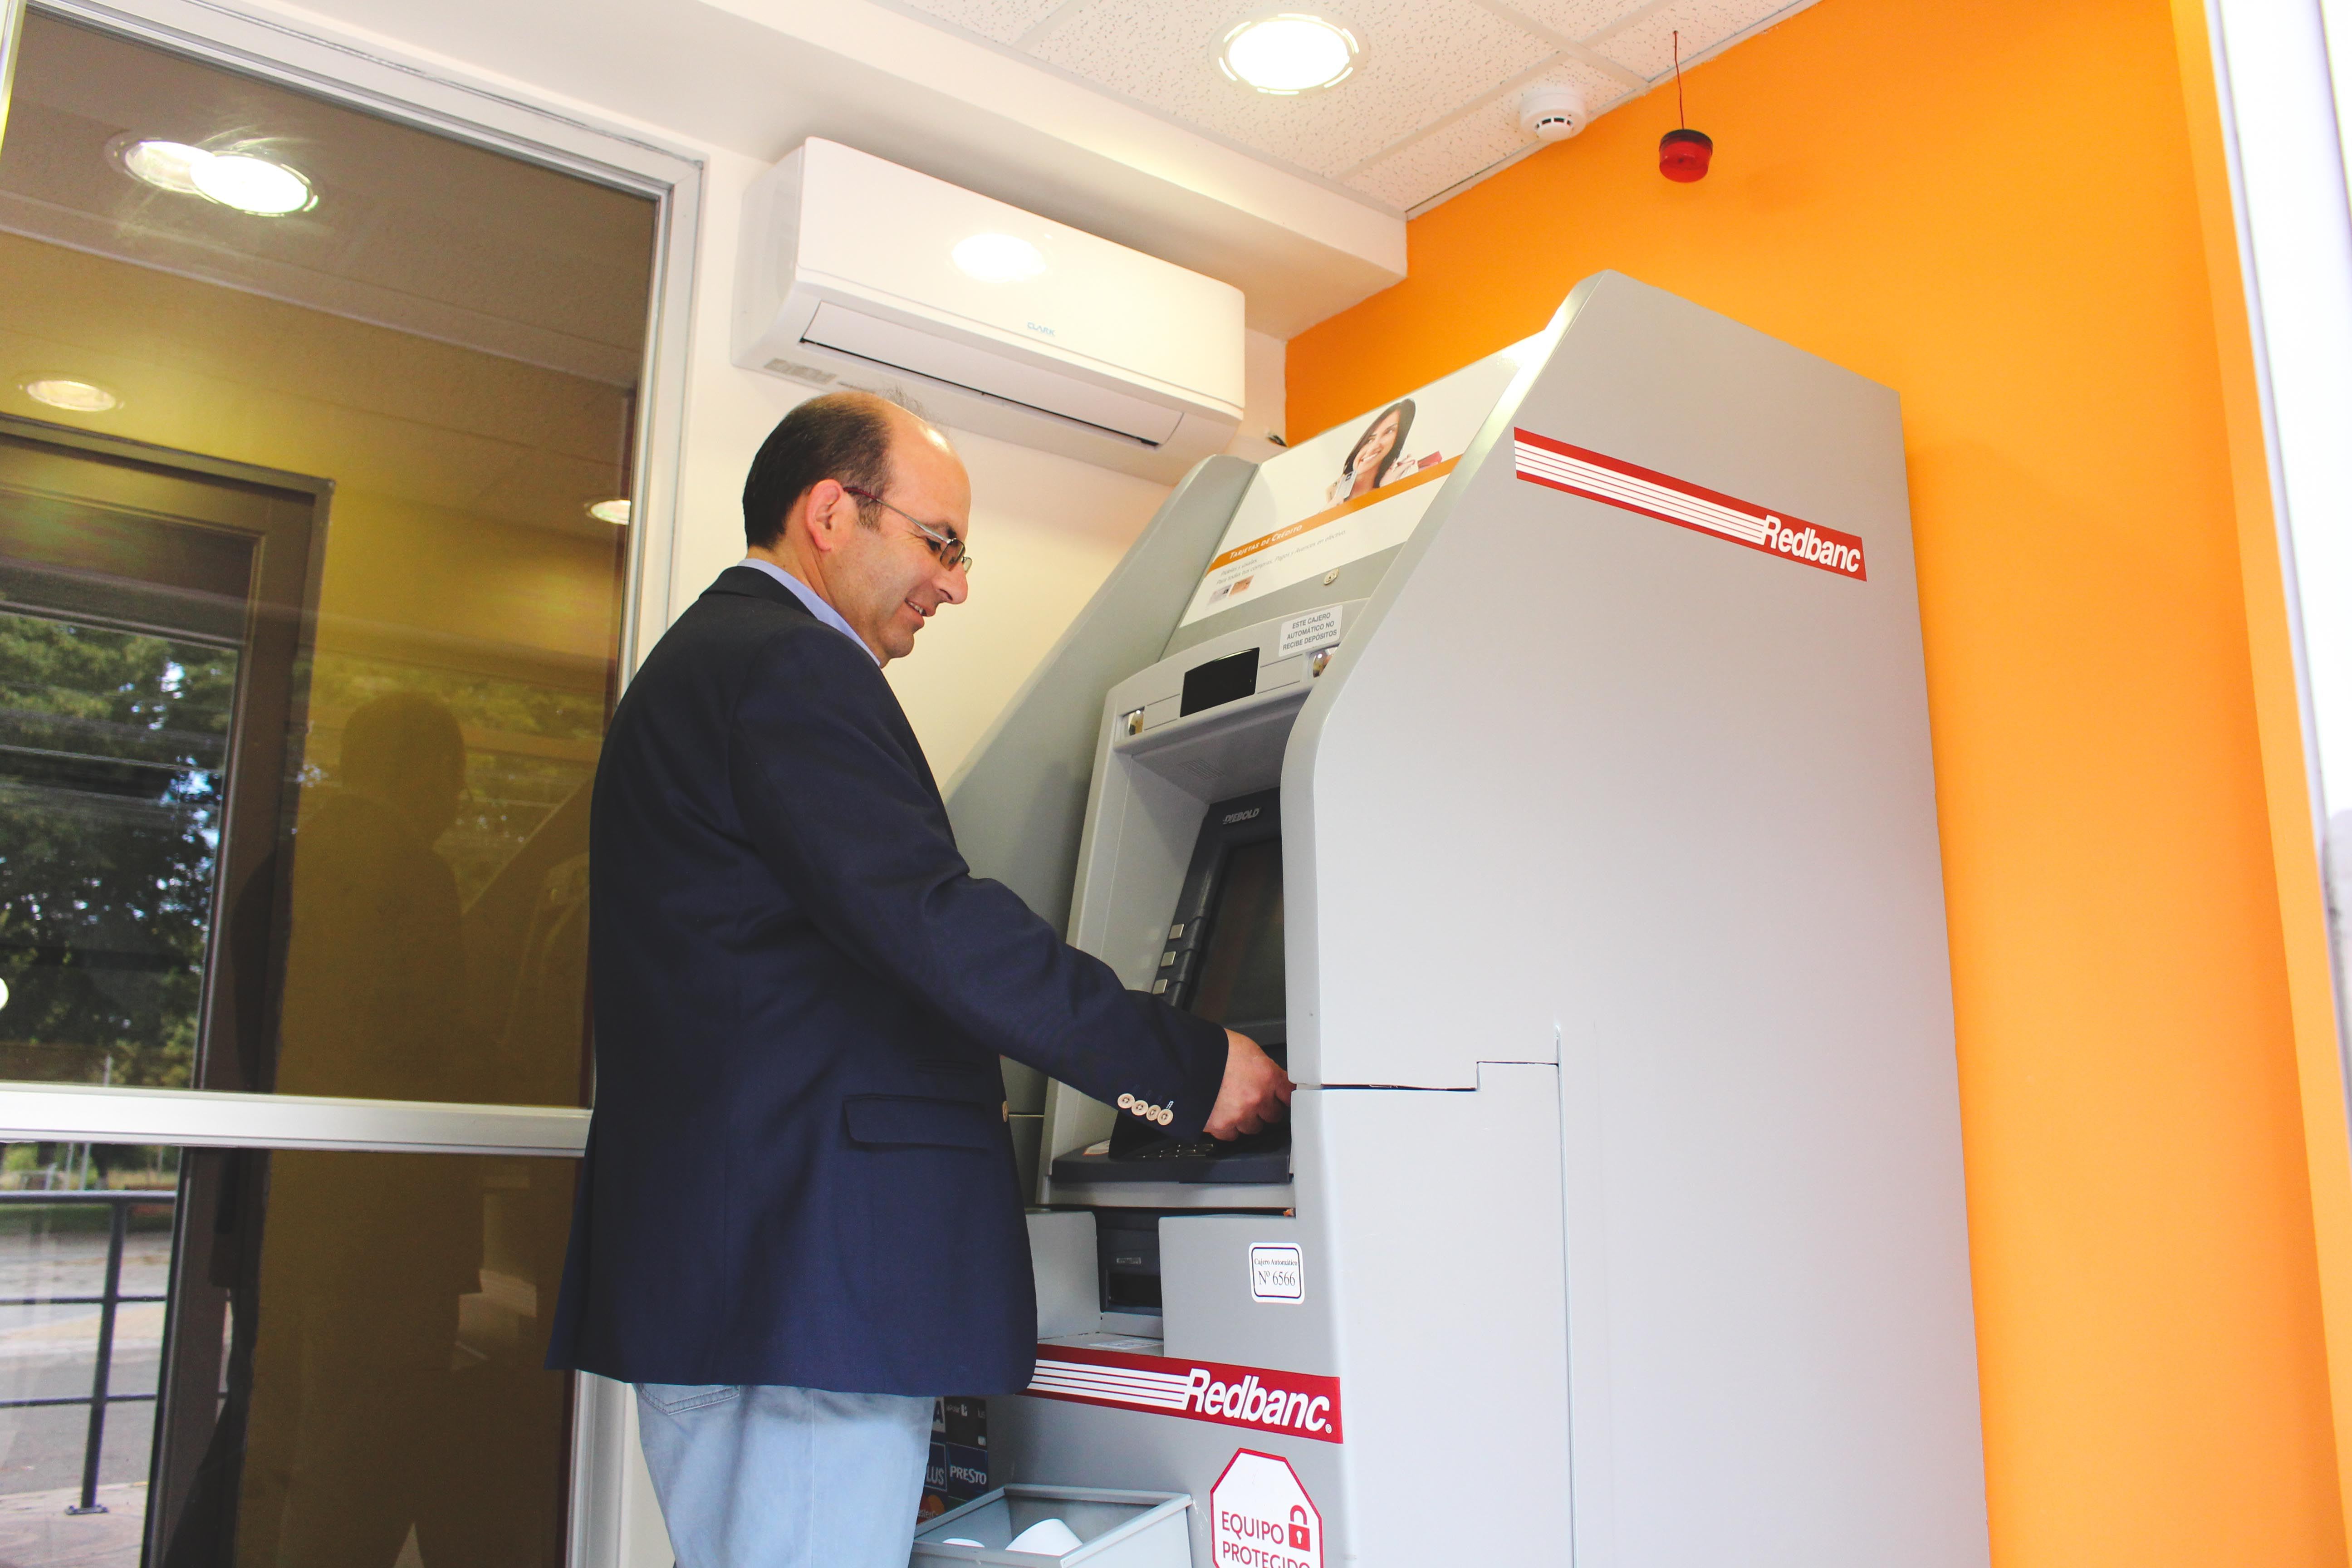 Cajero Automático de Quilleco vuelve a funcionar gracias a gestión Municipal.